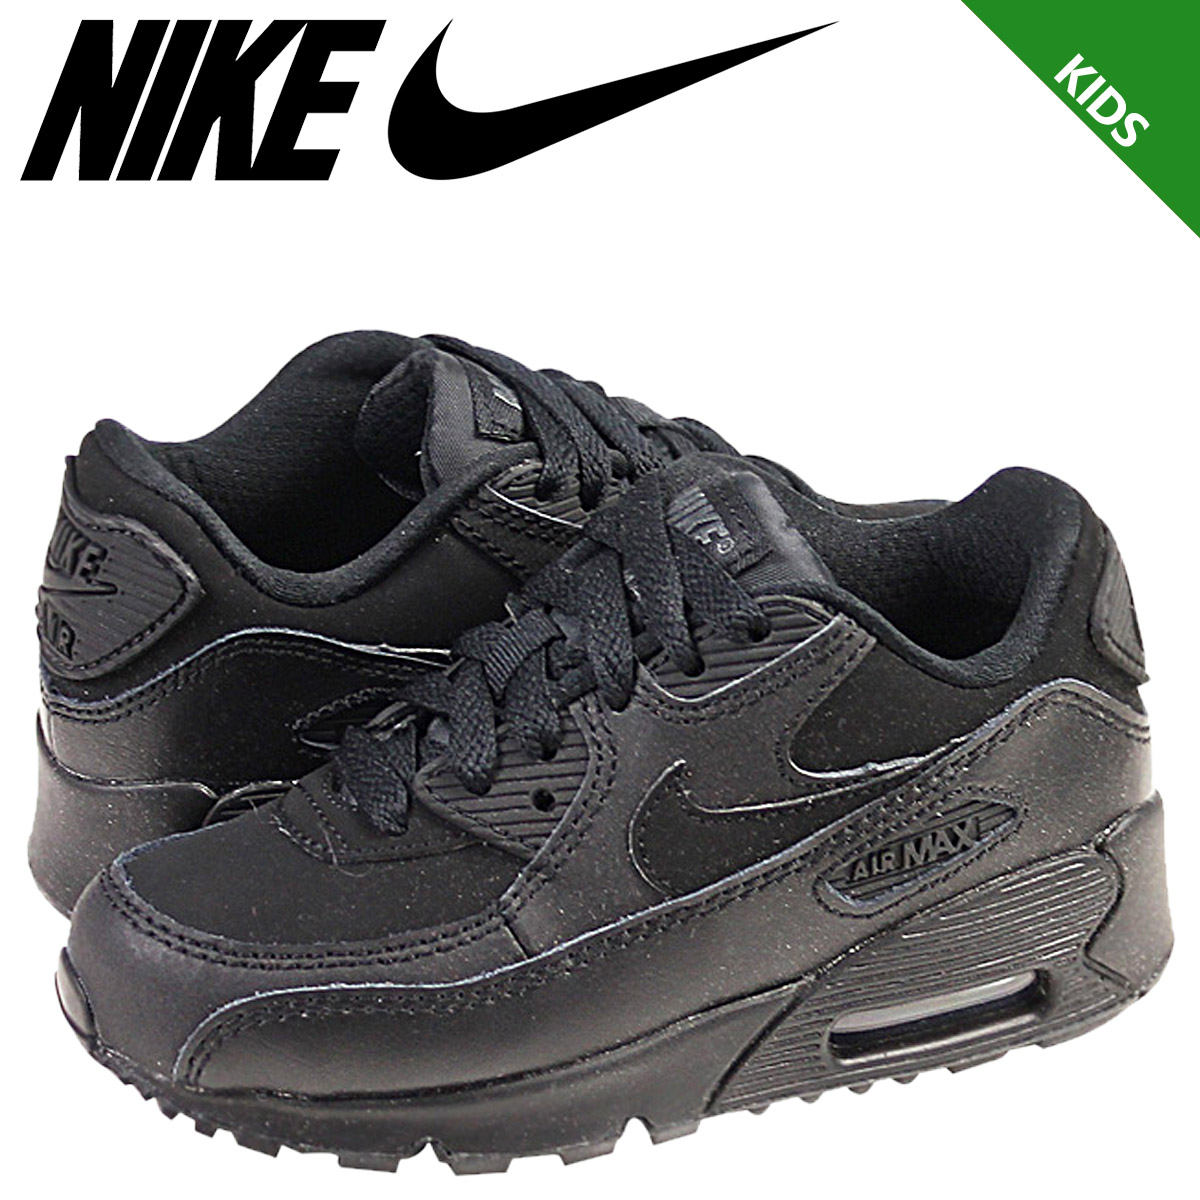 NIKE Nike Air Max sneakers kids PS AIR MAX 90 Air Max 90 307794 091 shoes black